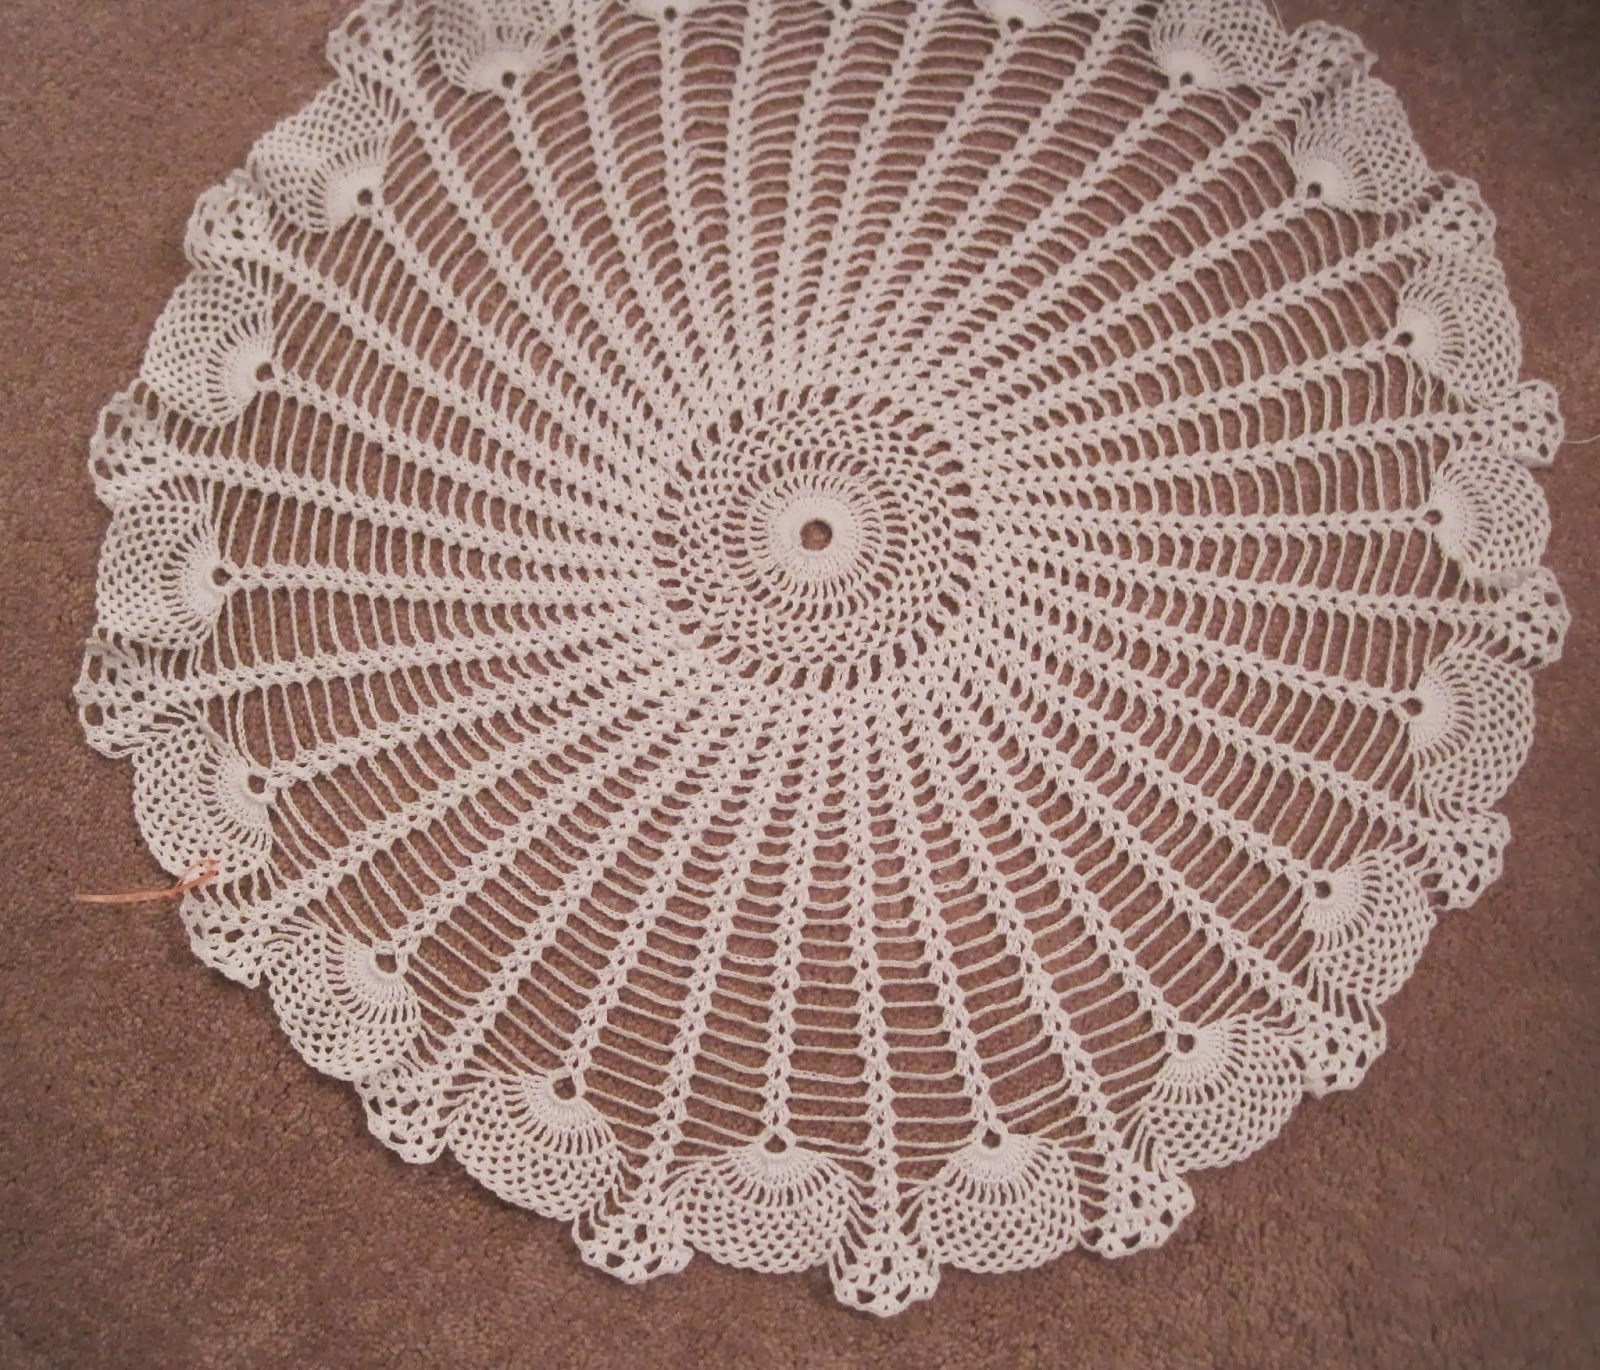 Scene Through My Eyes: Let\'s Crochet a Little - or Not